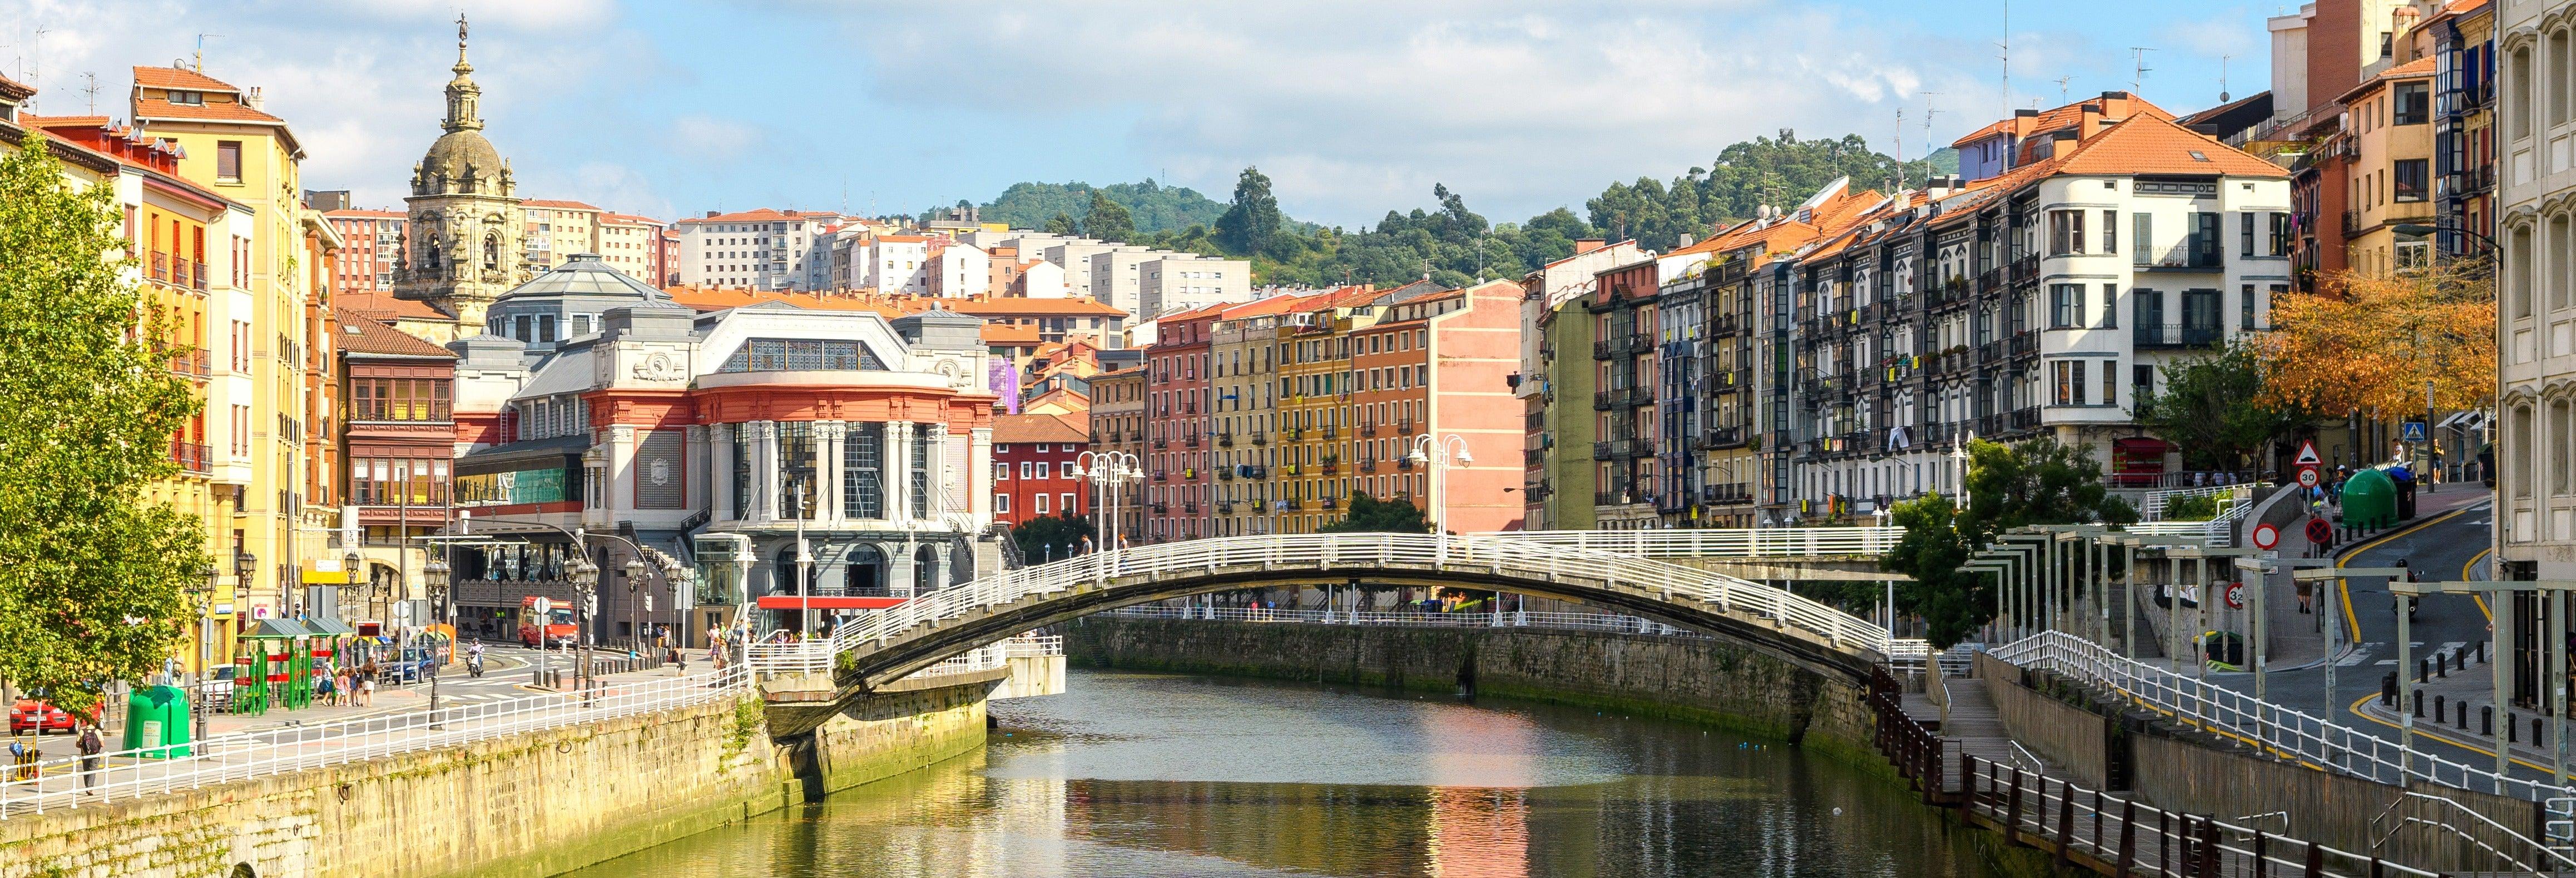 Tour por Bilbao + Funicular de Artxanda